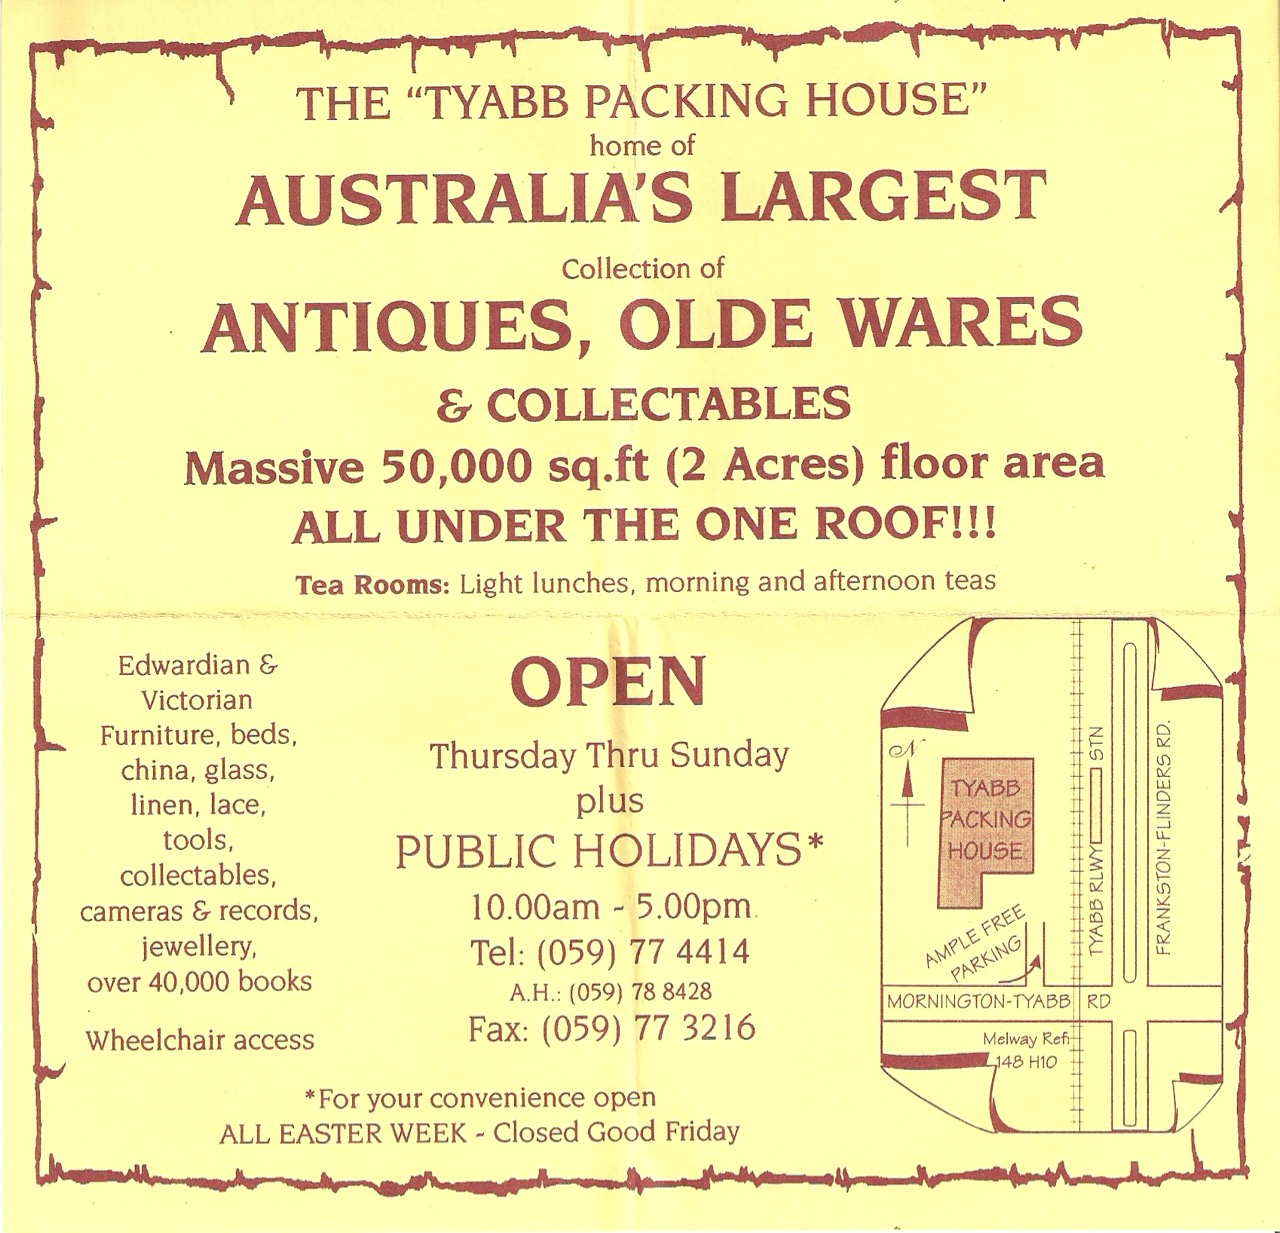 1996 interior card